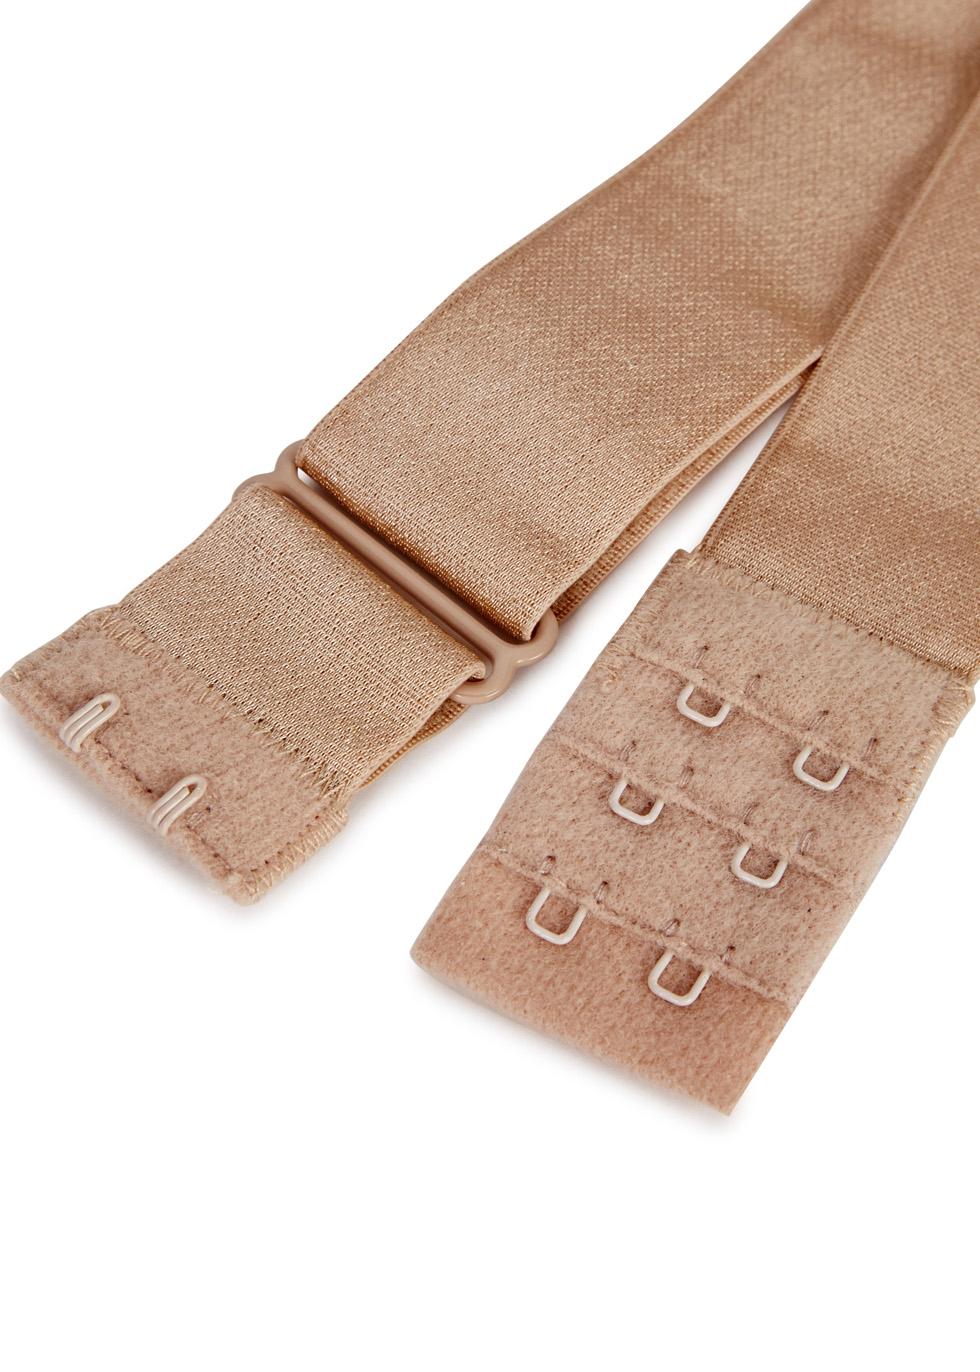 Almond adjustable low-back strap - set of 2 - FASHION FORMS